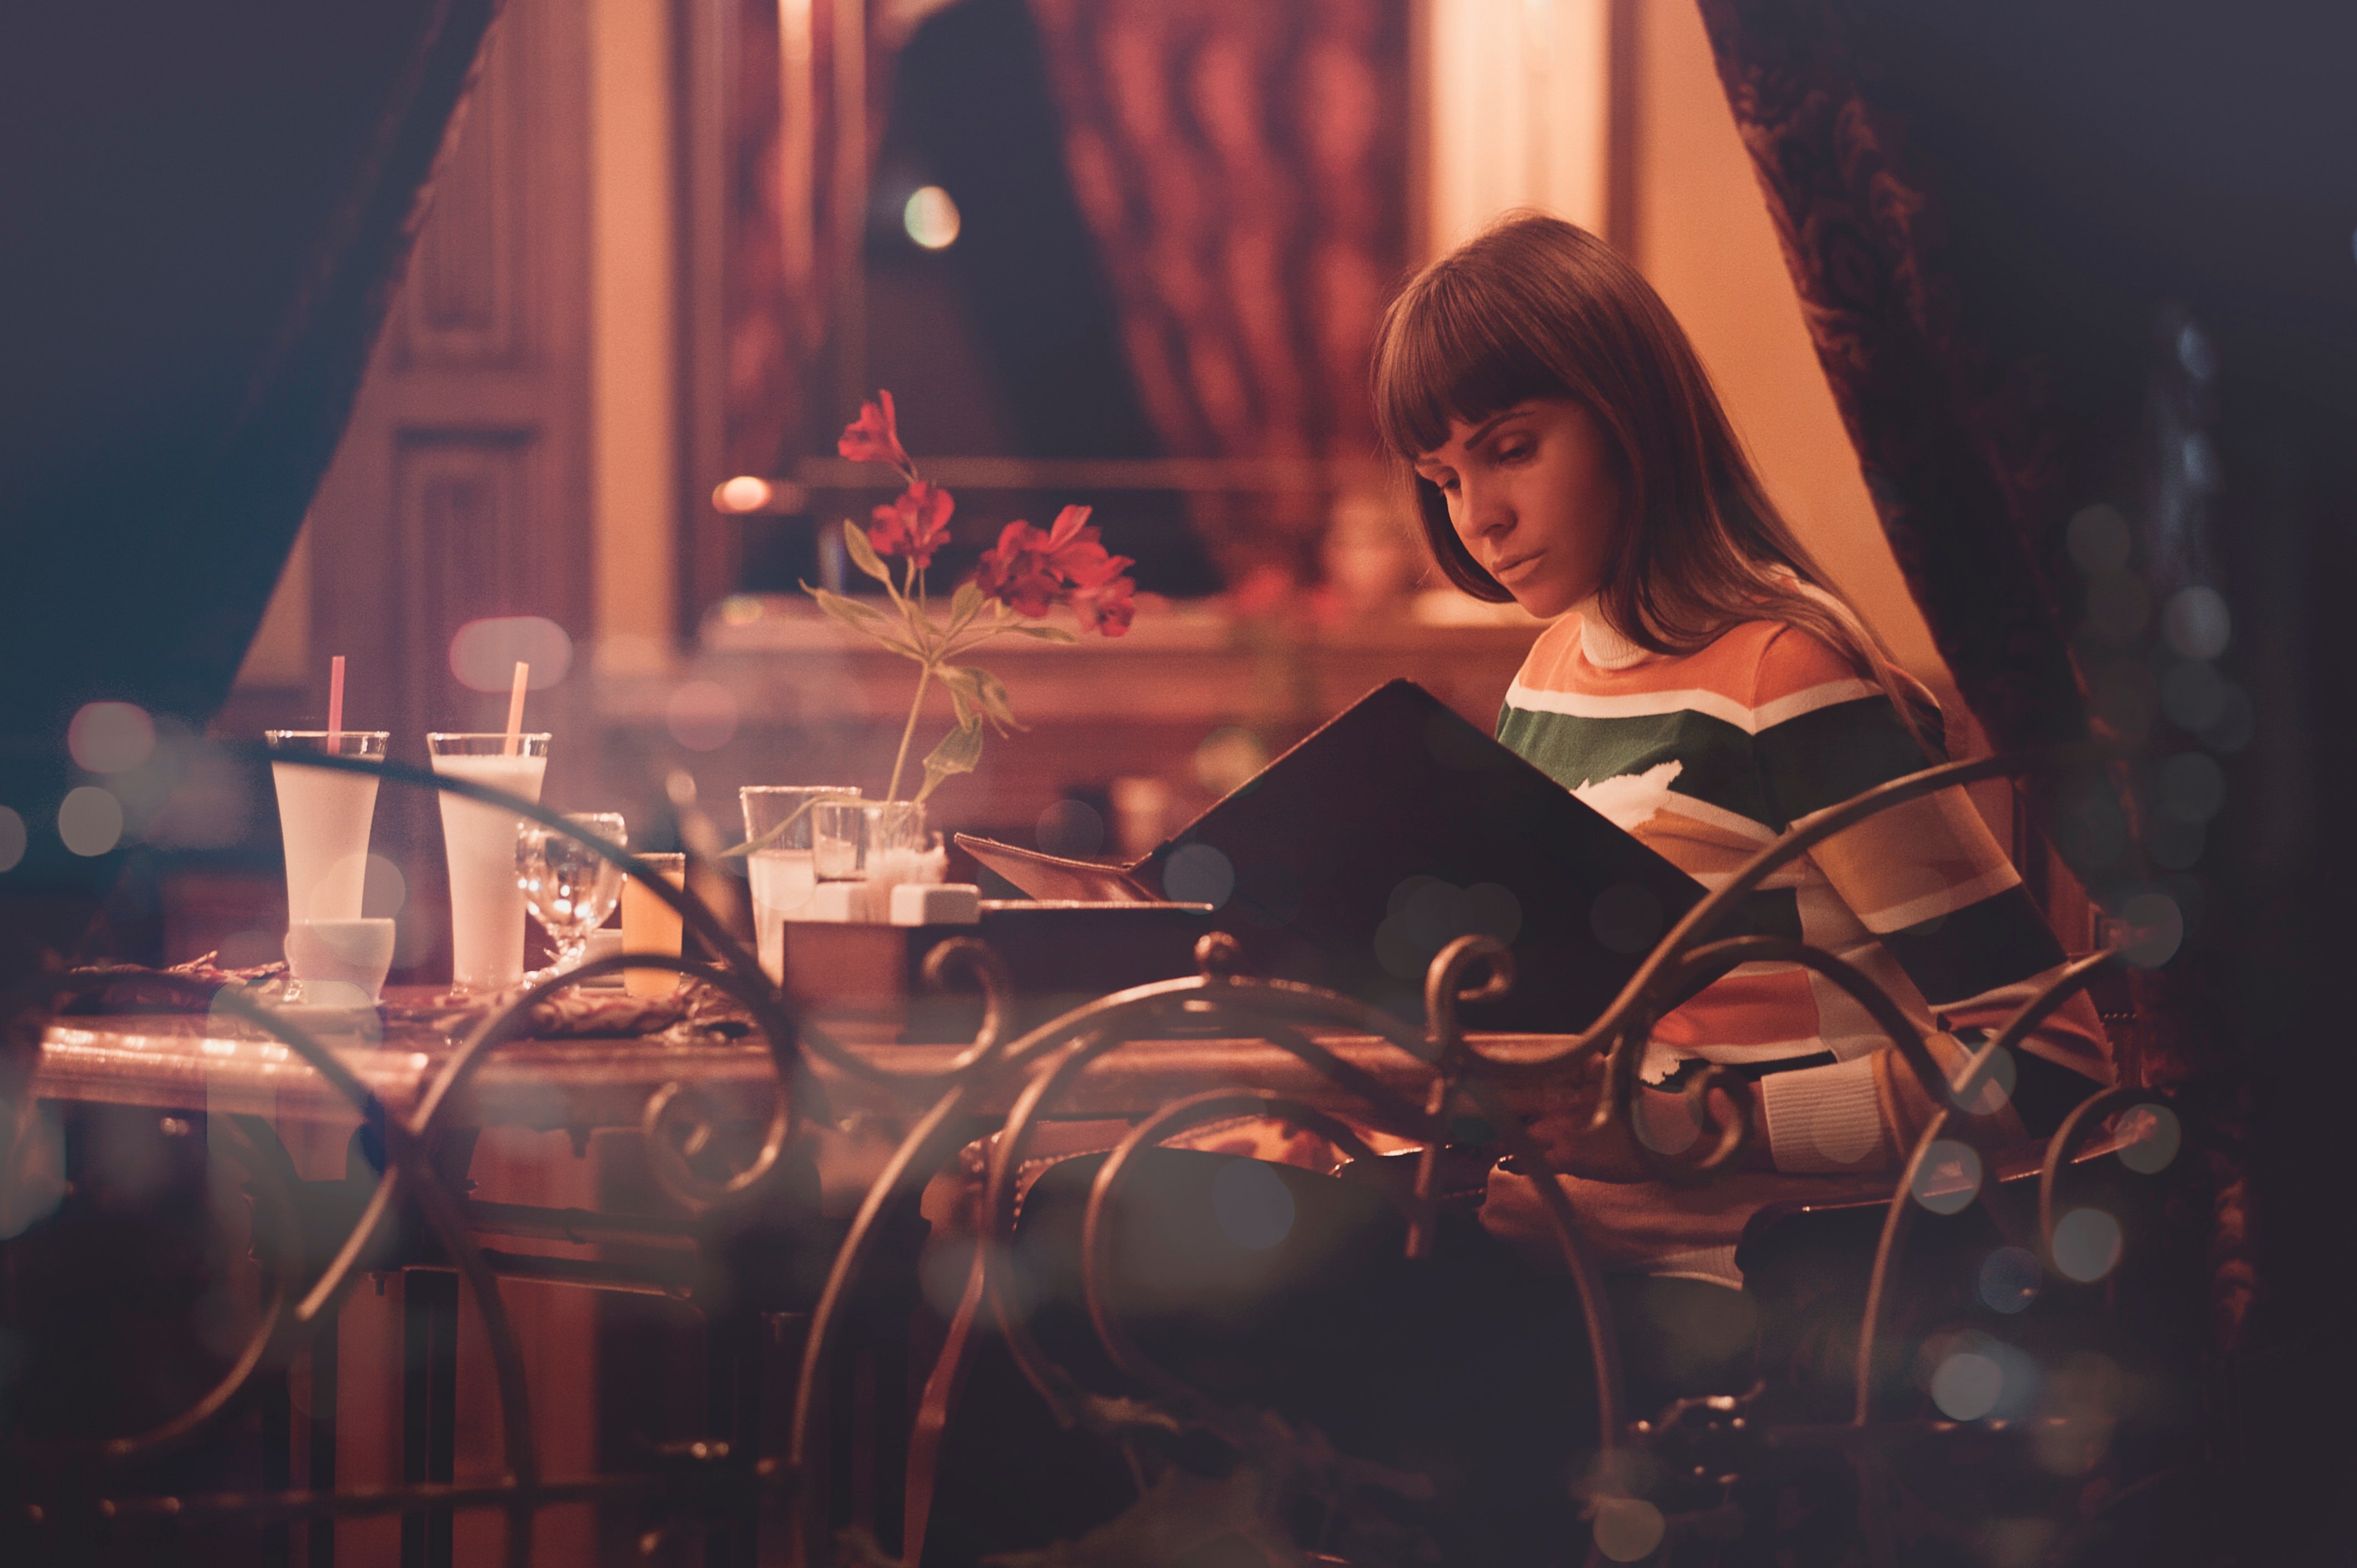 Woman Sitting in a Room, Adult, Menu, Window, Waiting, HQ Photo